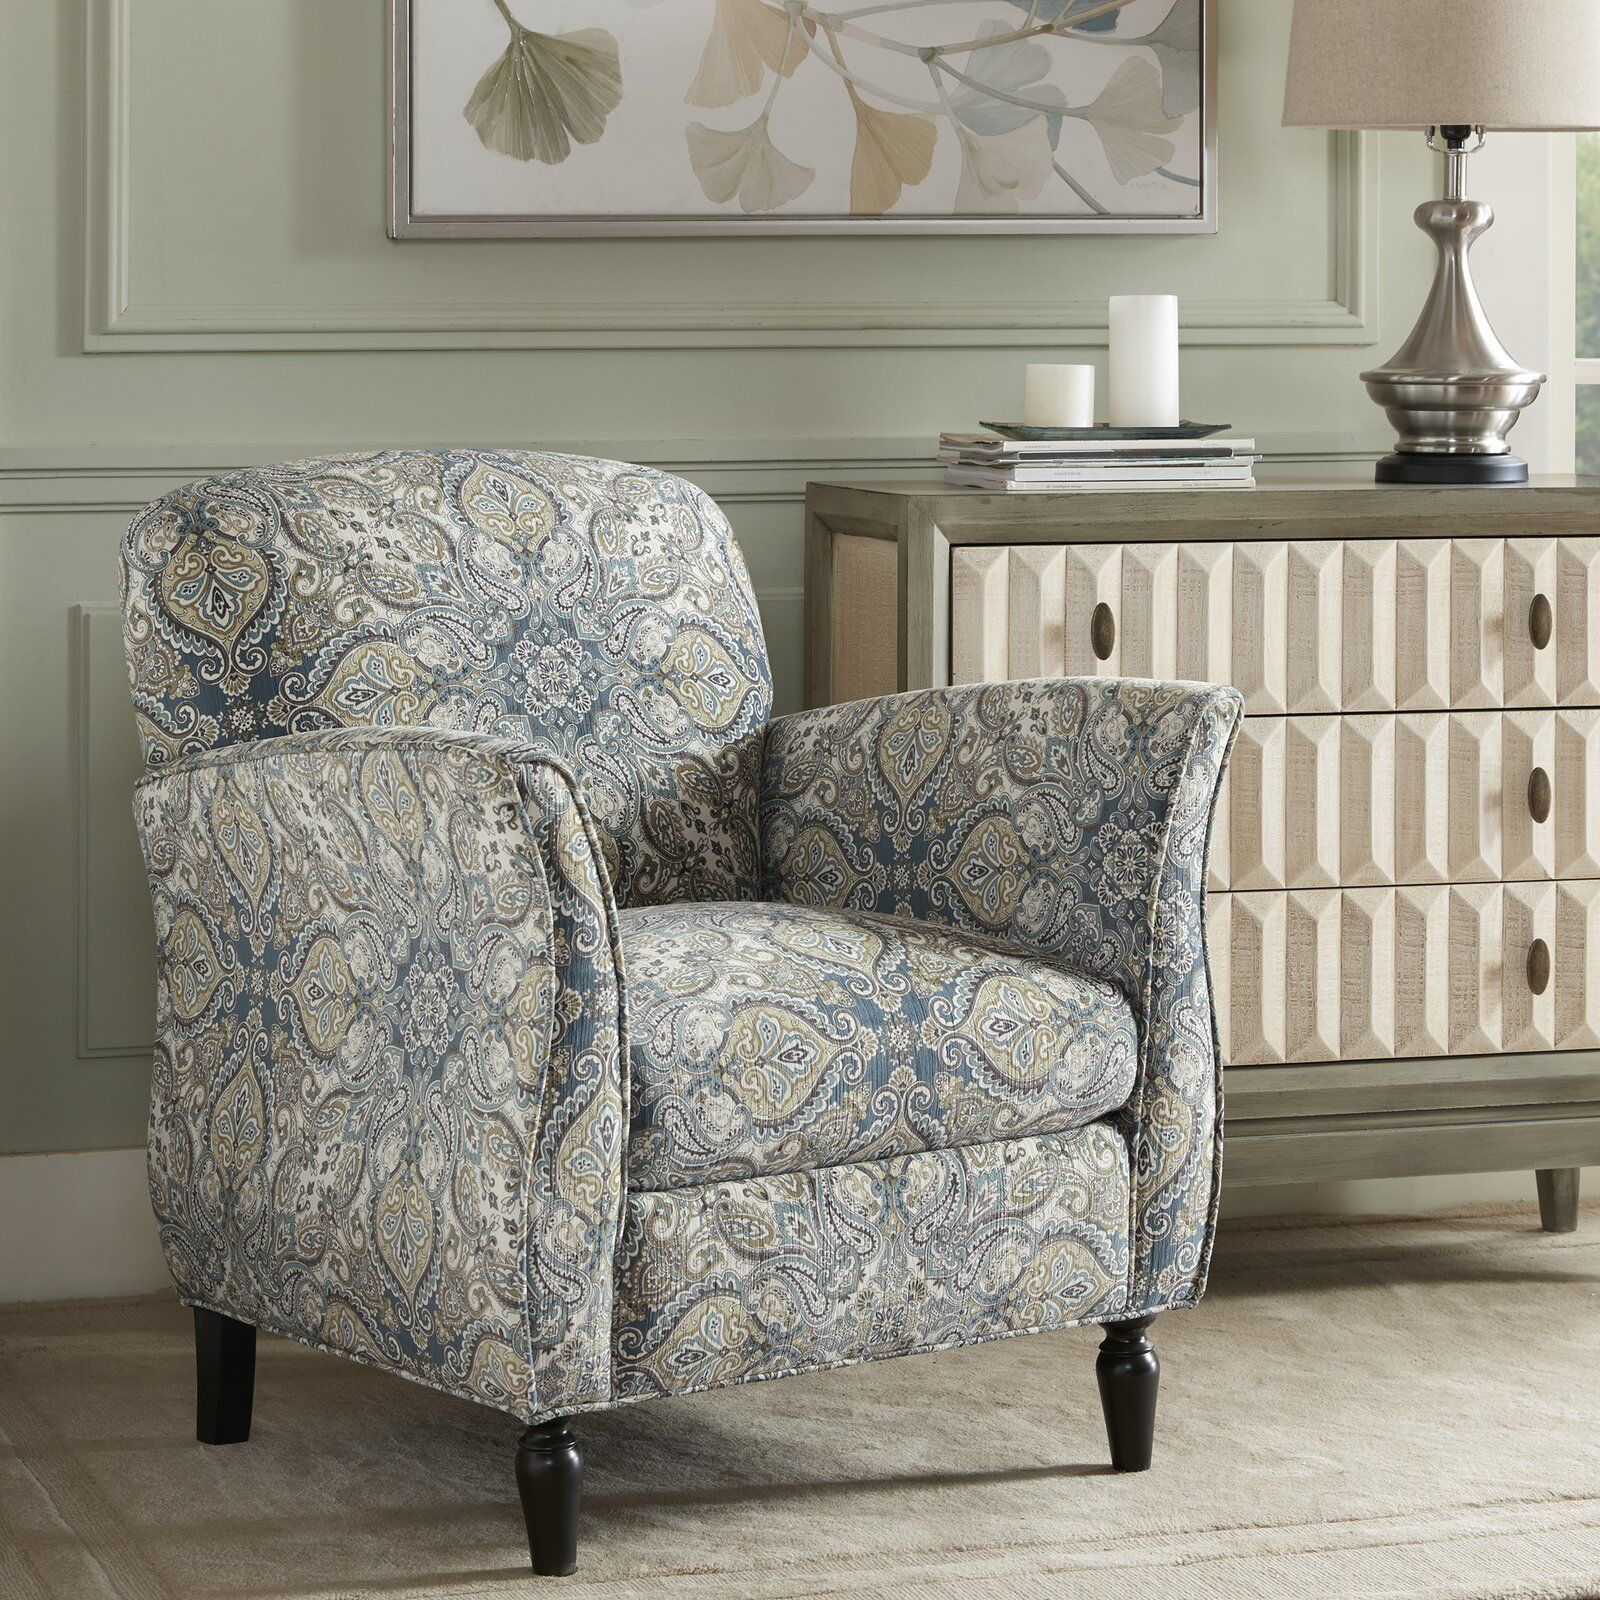 Pin On Furniture Regarding Wainfleet Armchairs (View 3 of 15)